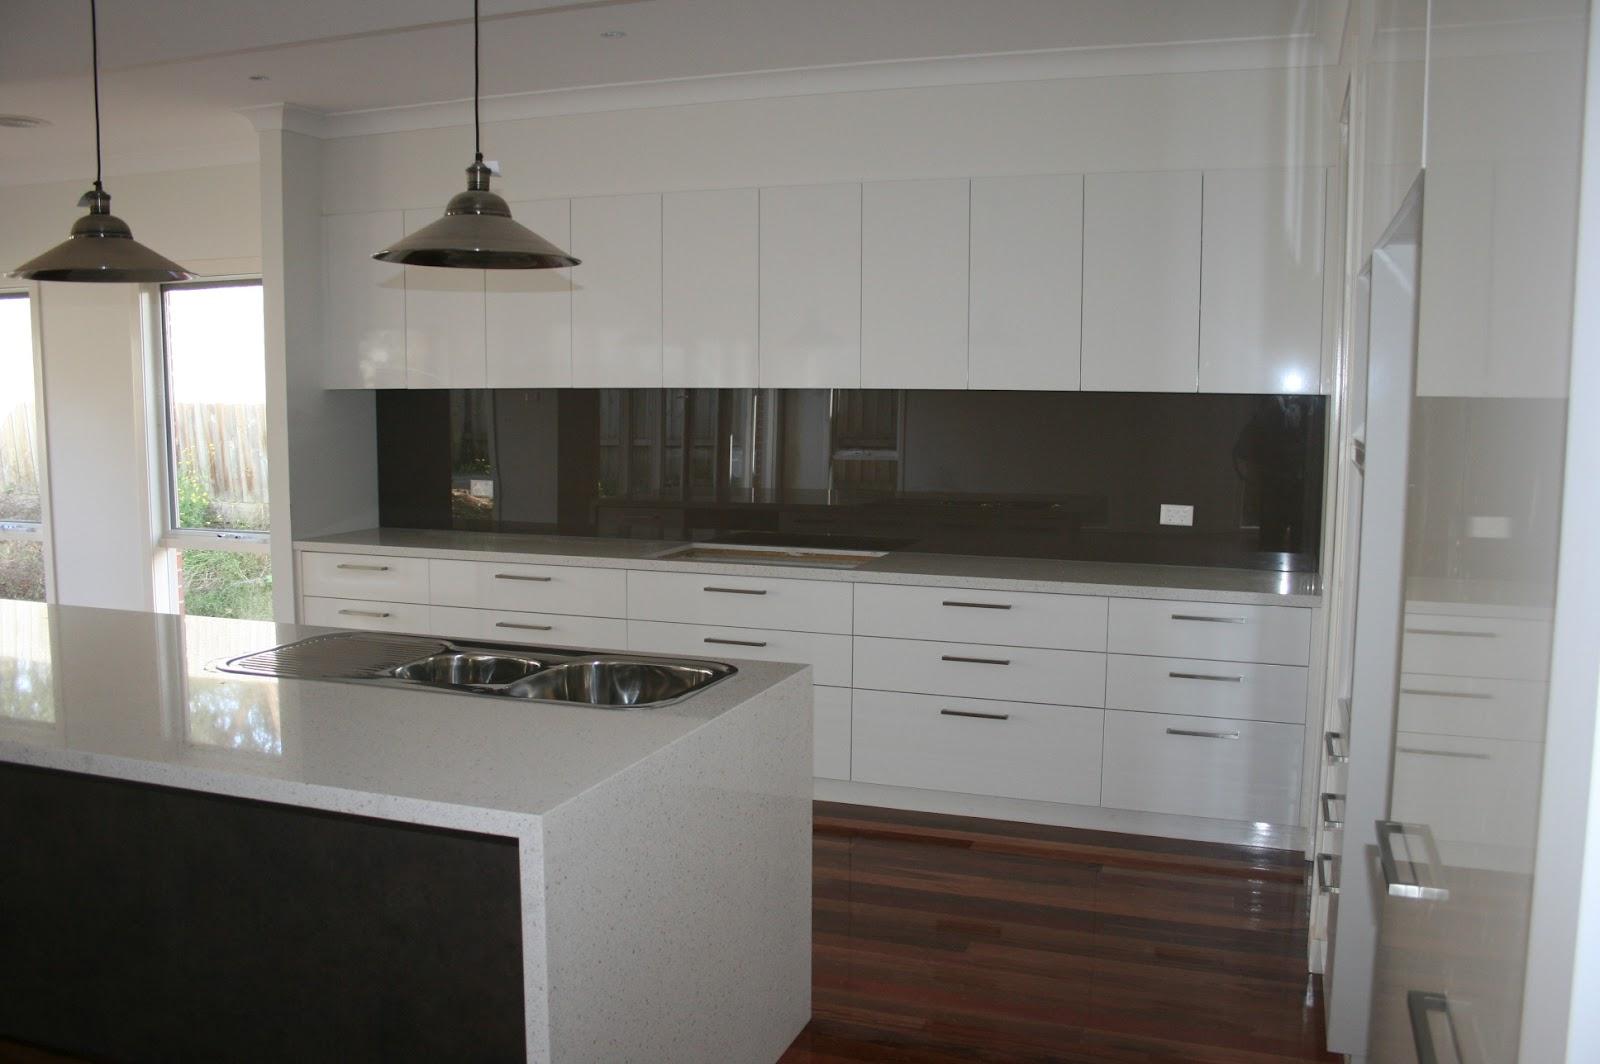 Building parkview splashback for Splashback kitchen designs